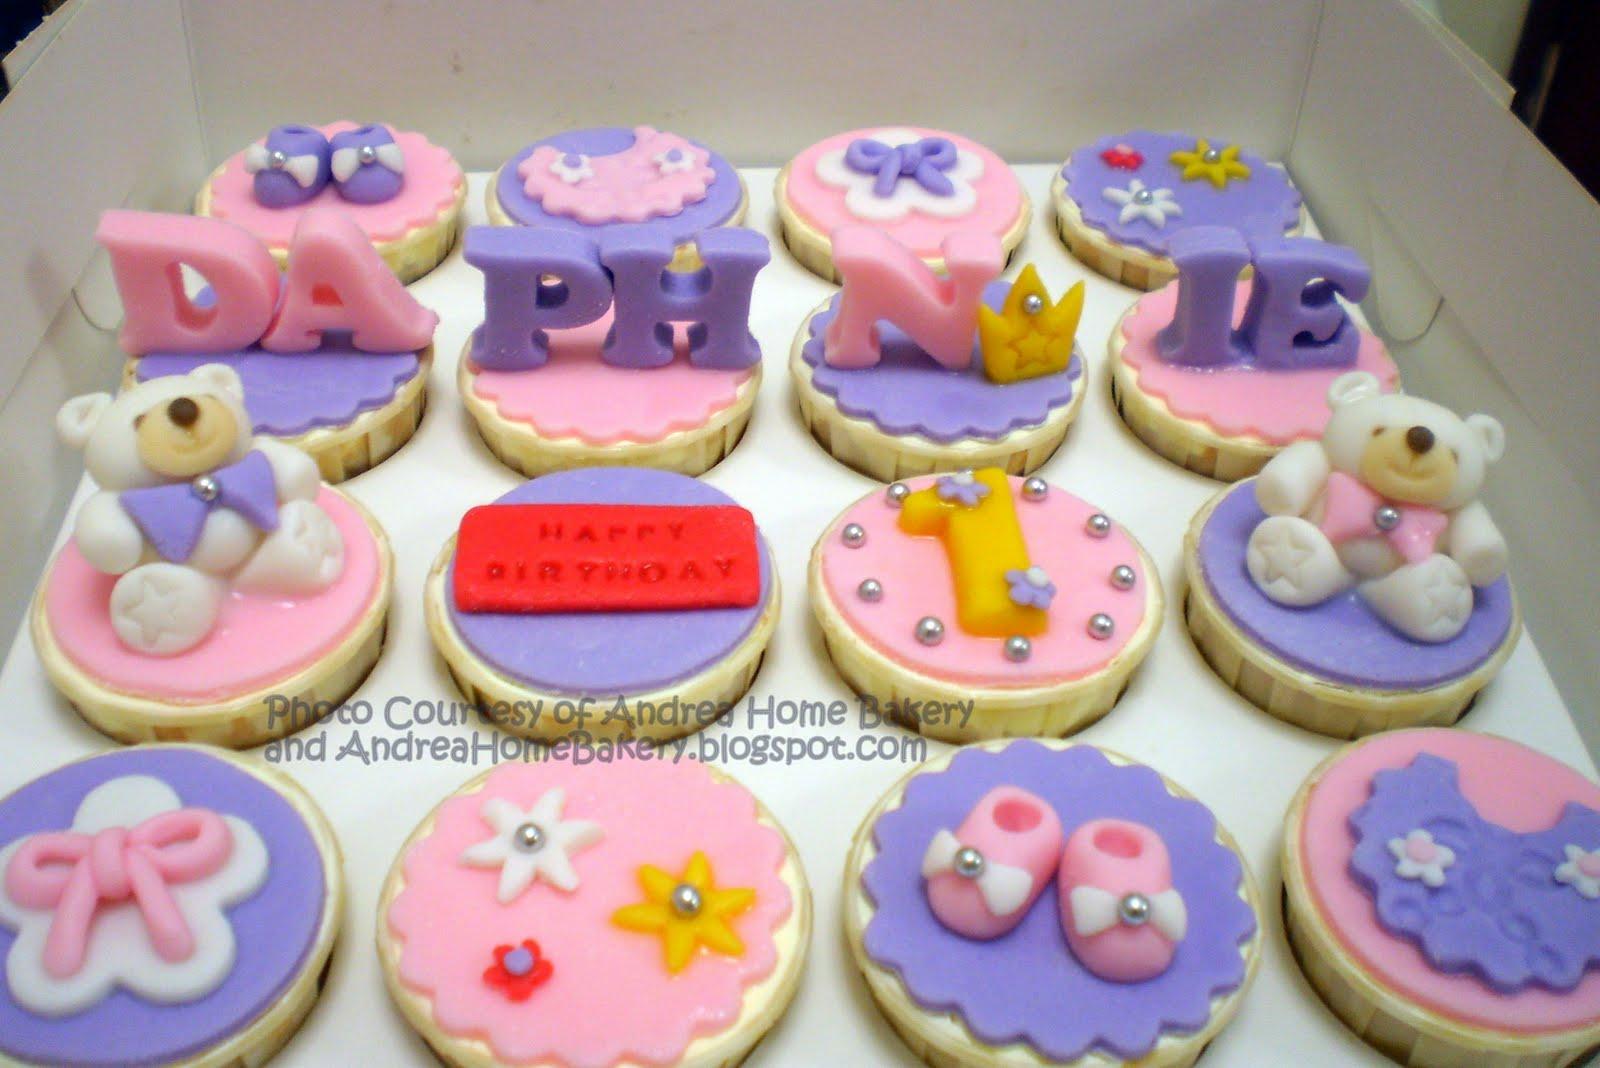 andrea home bakery mutiara damansara home baked with love